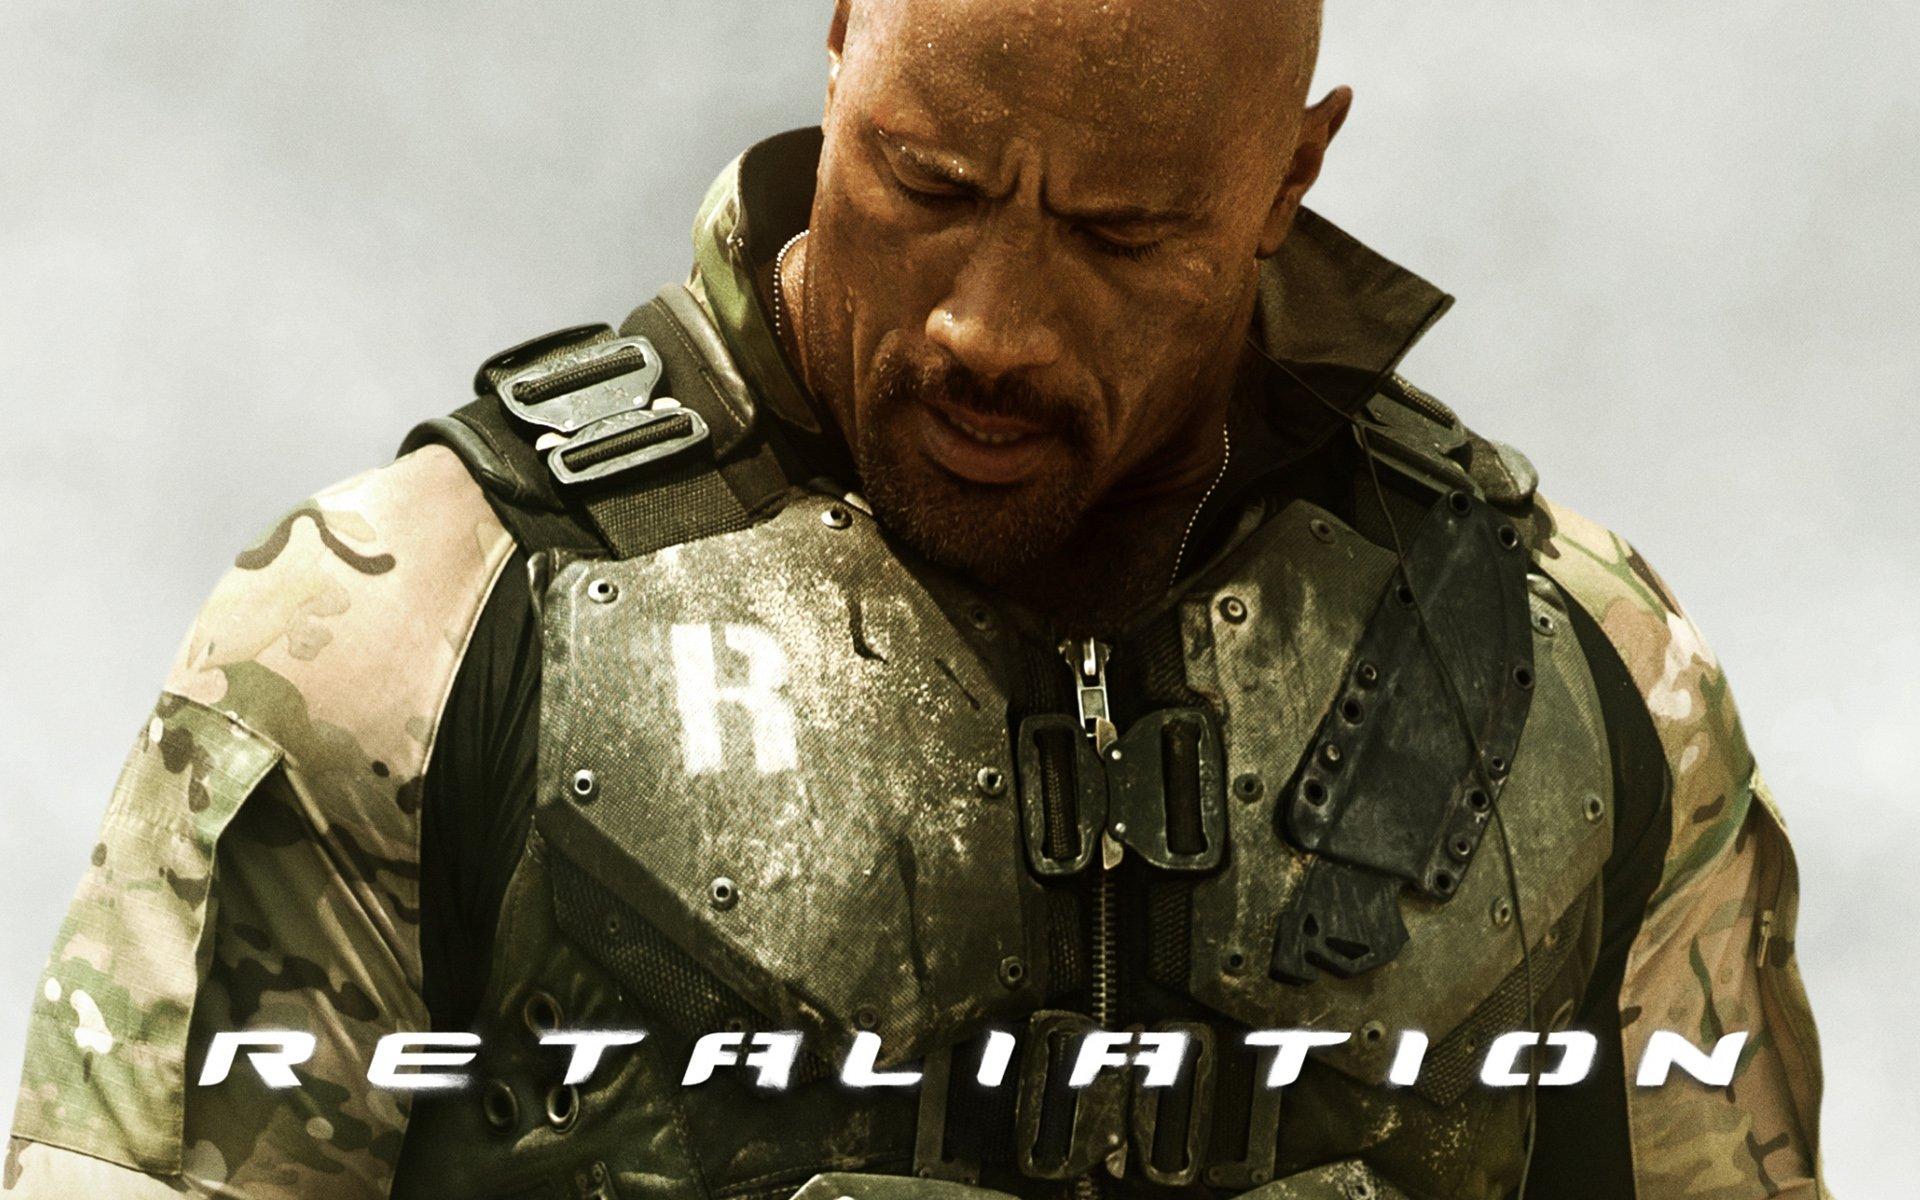 53 g.i. joe: retaliation hd wallpapers | background images